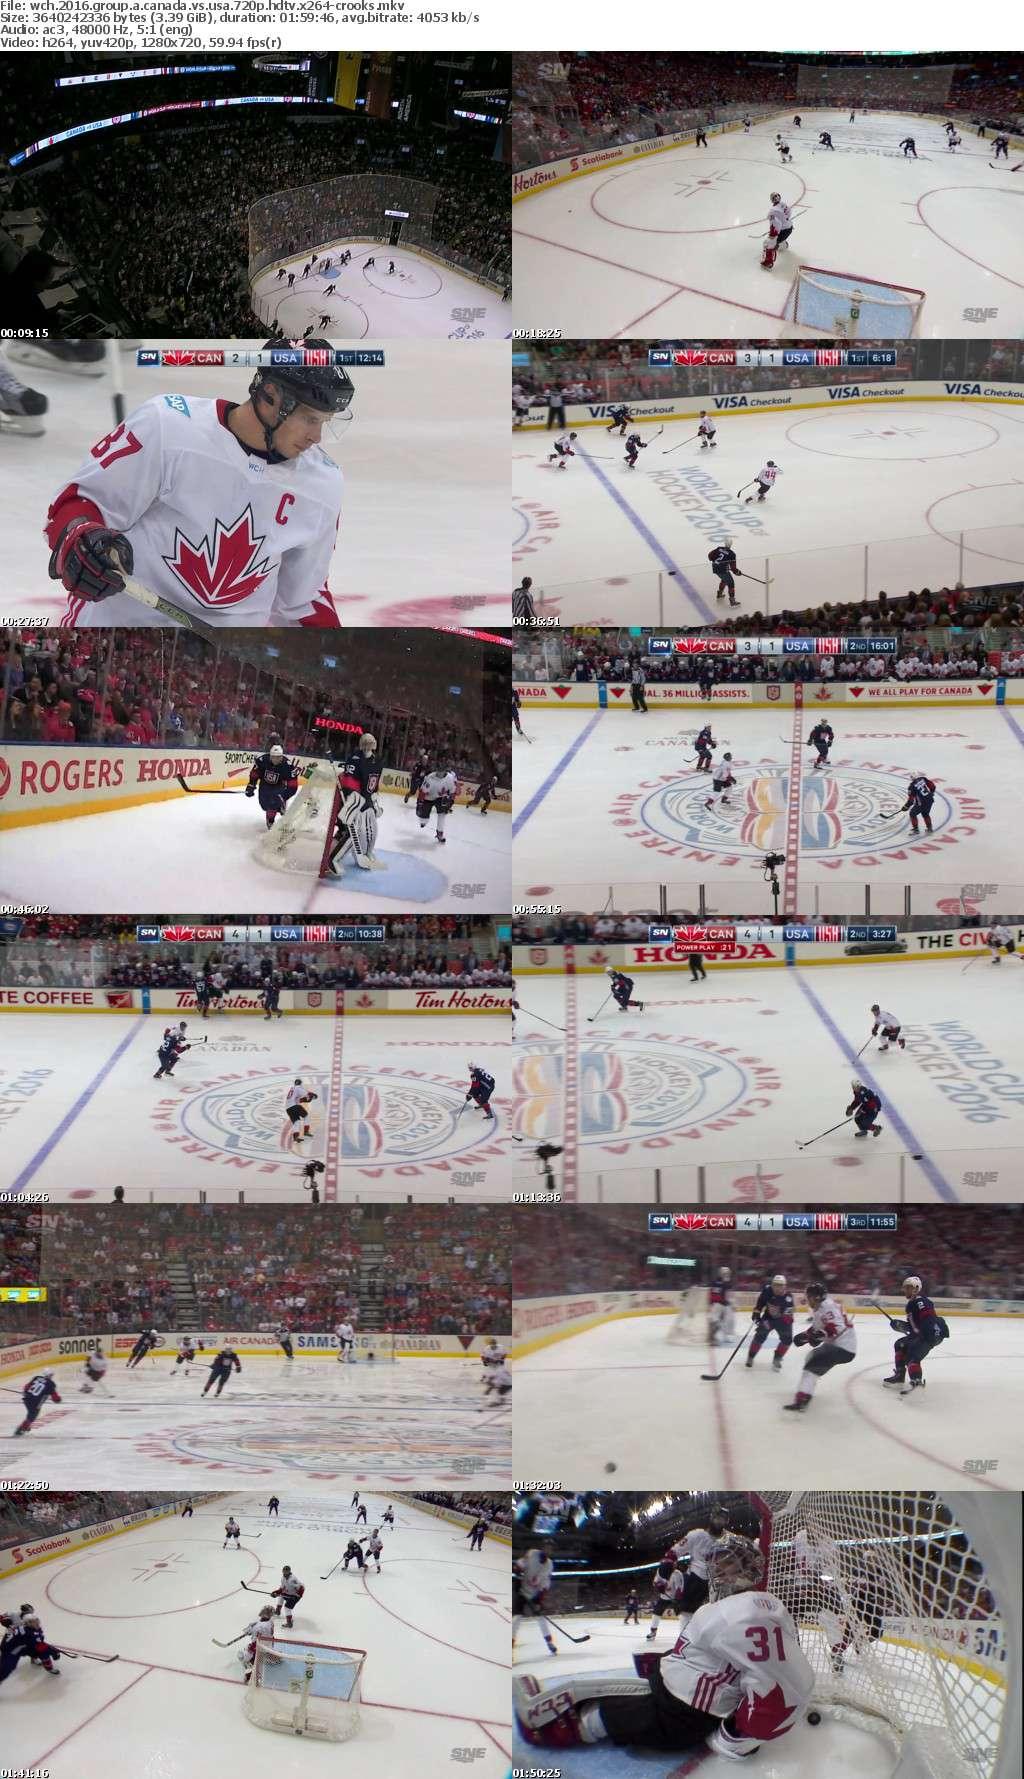 WCH 2016 Group A Canada vs USA 720p HDTV x264-CROOKS